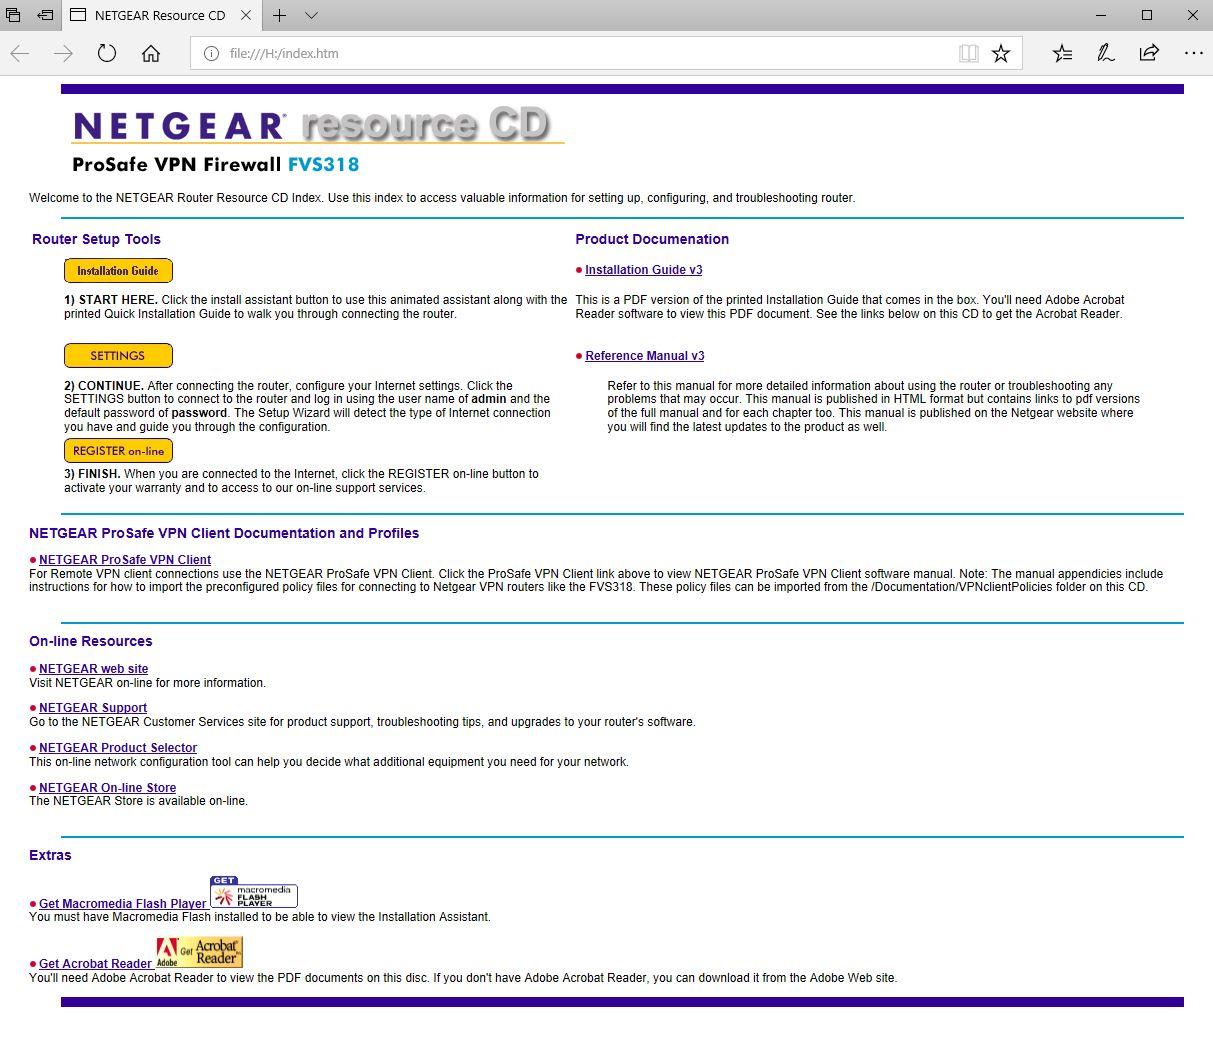 ISO Image of Netgear FVS318v3 Support CD